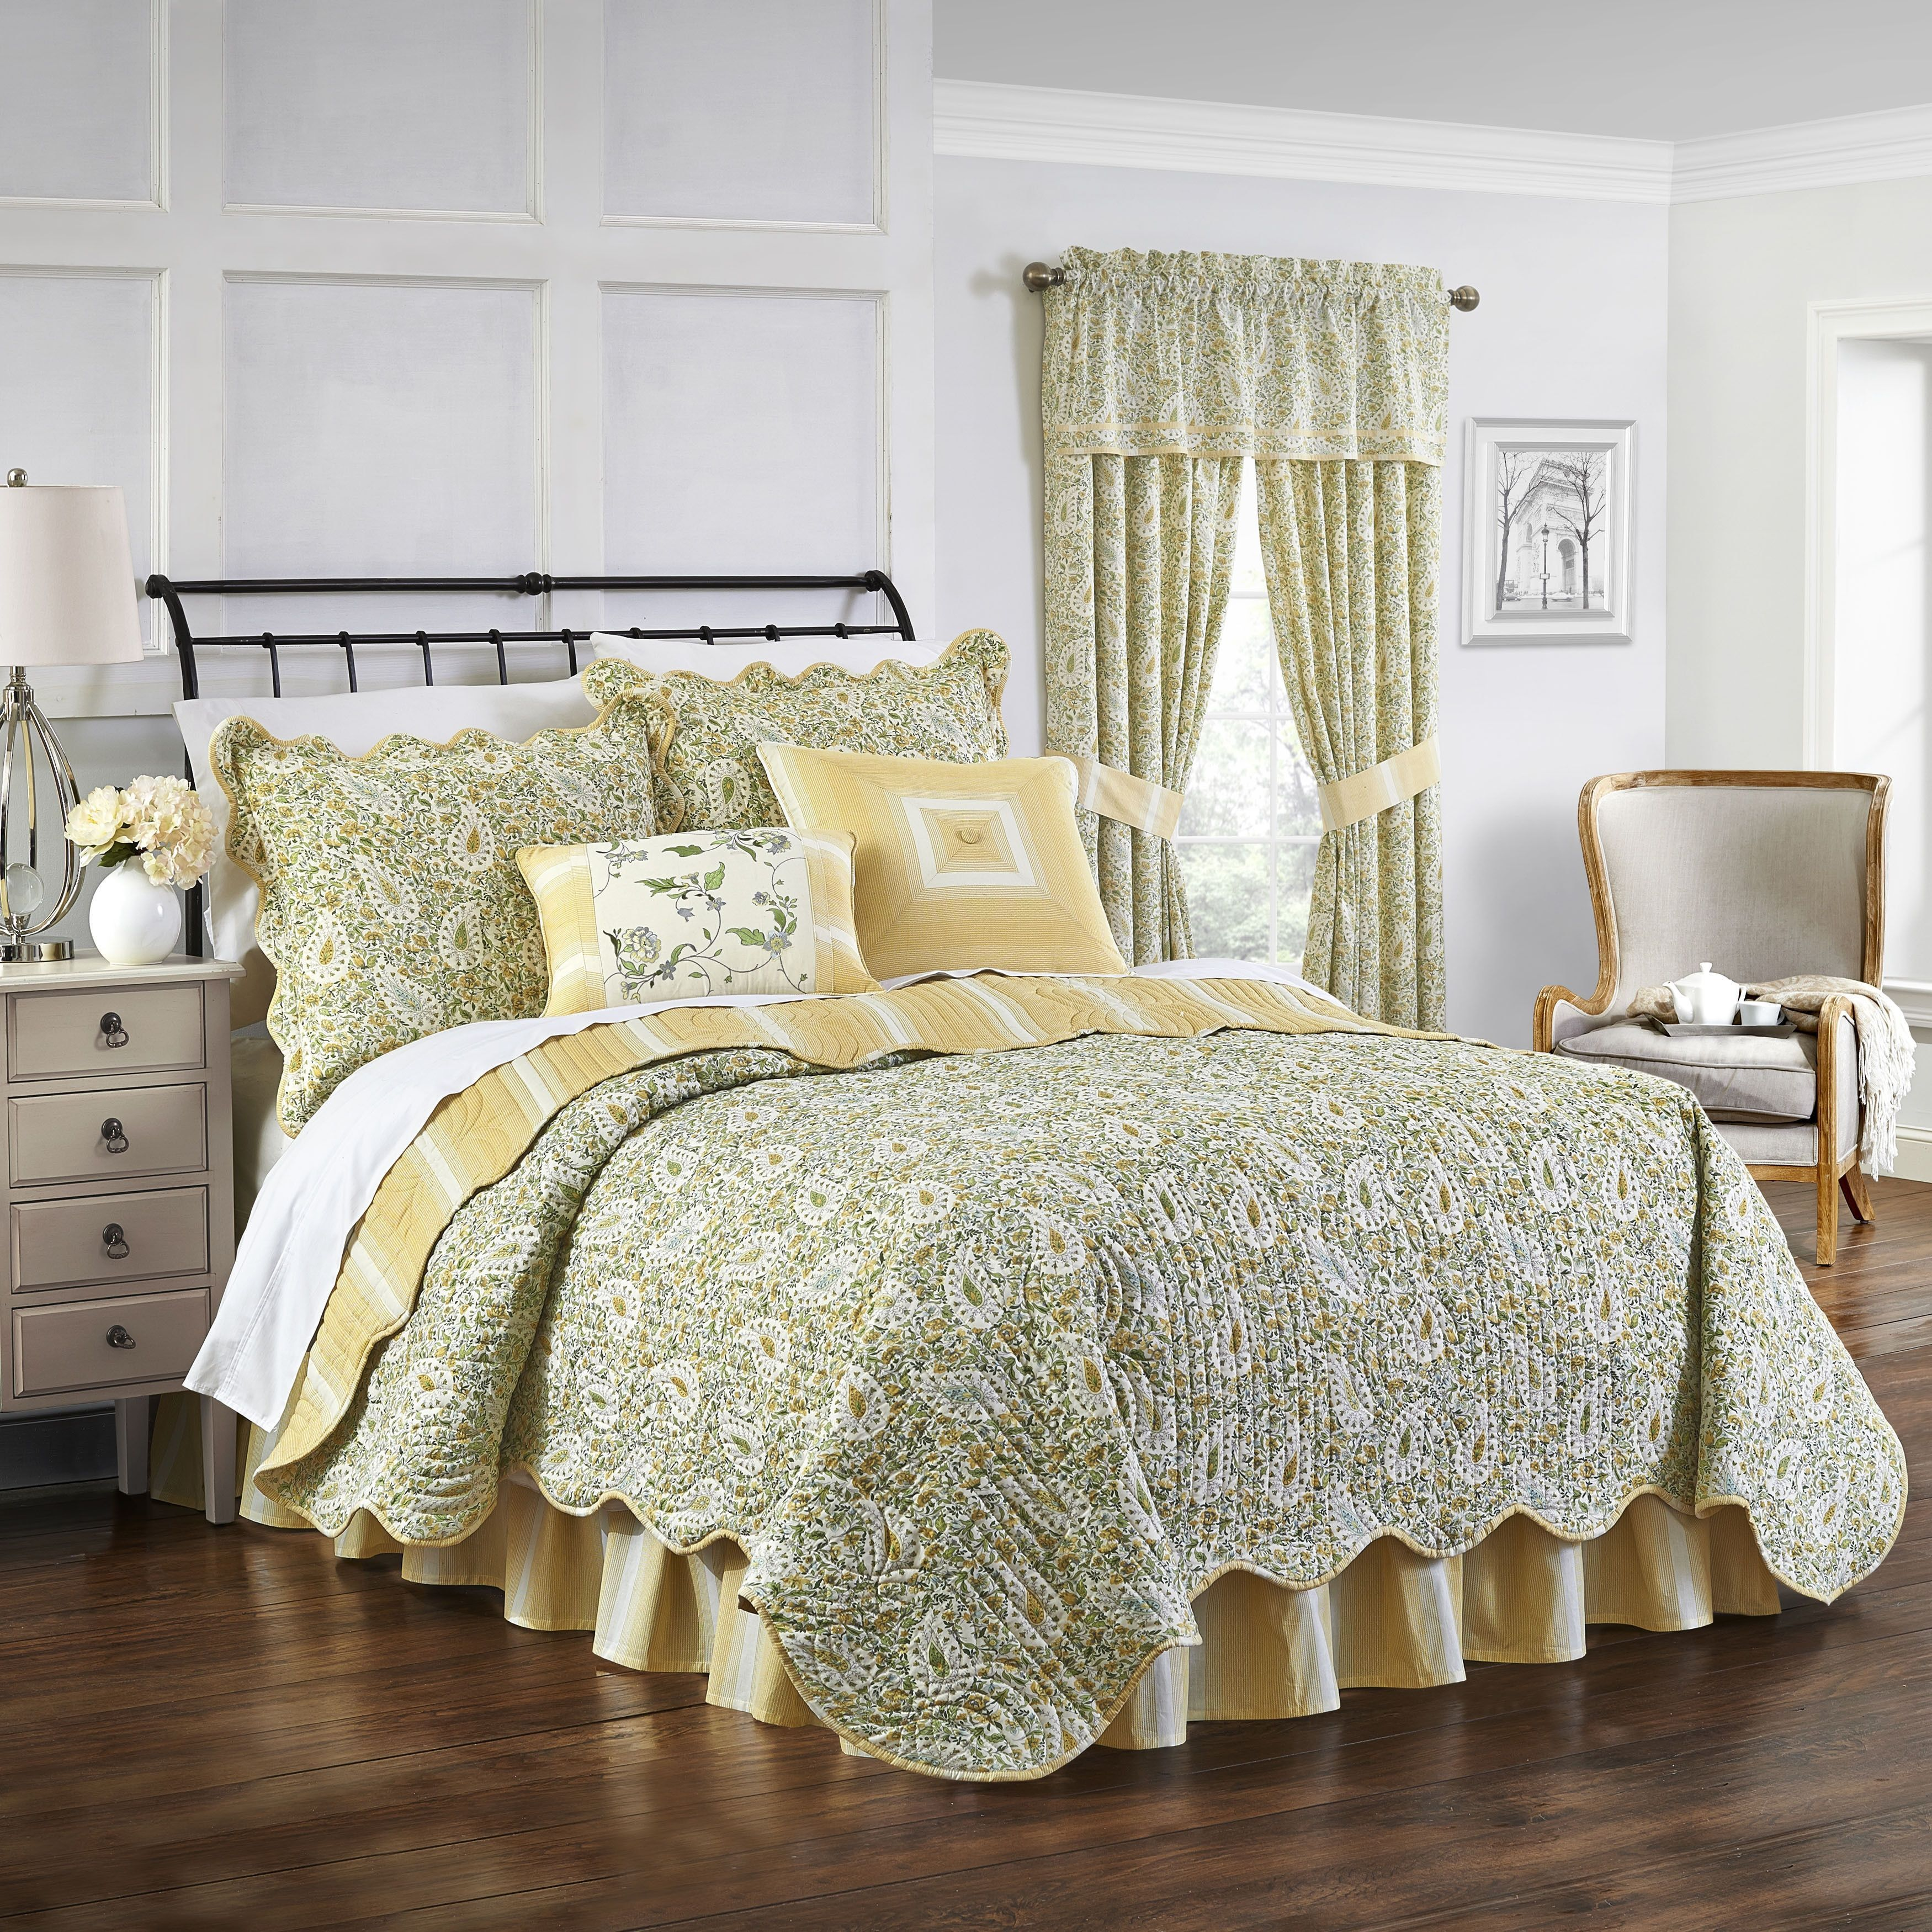 white bed decor shipping product overstock lush on venetian bath free set piece com bedding comforter